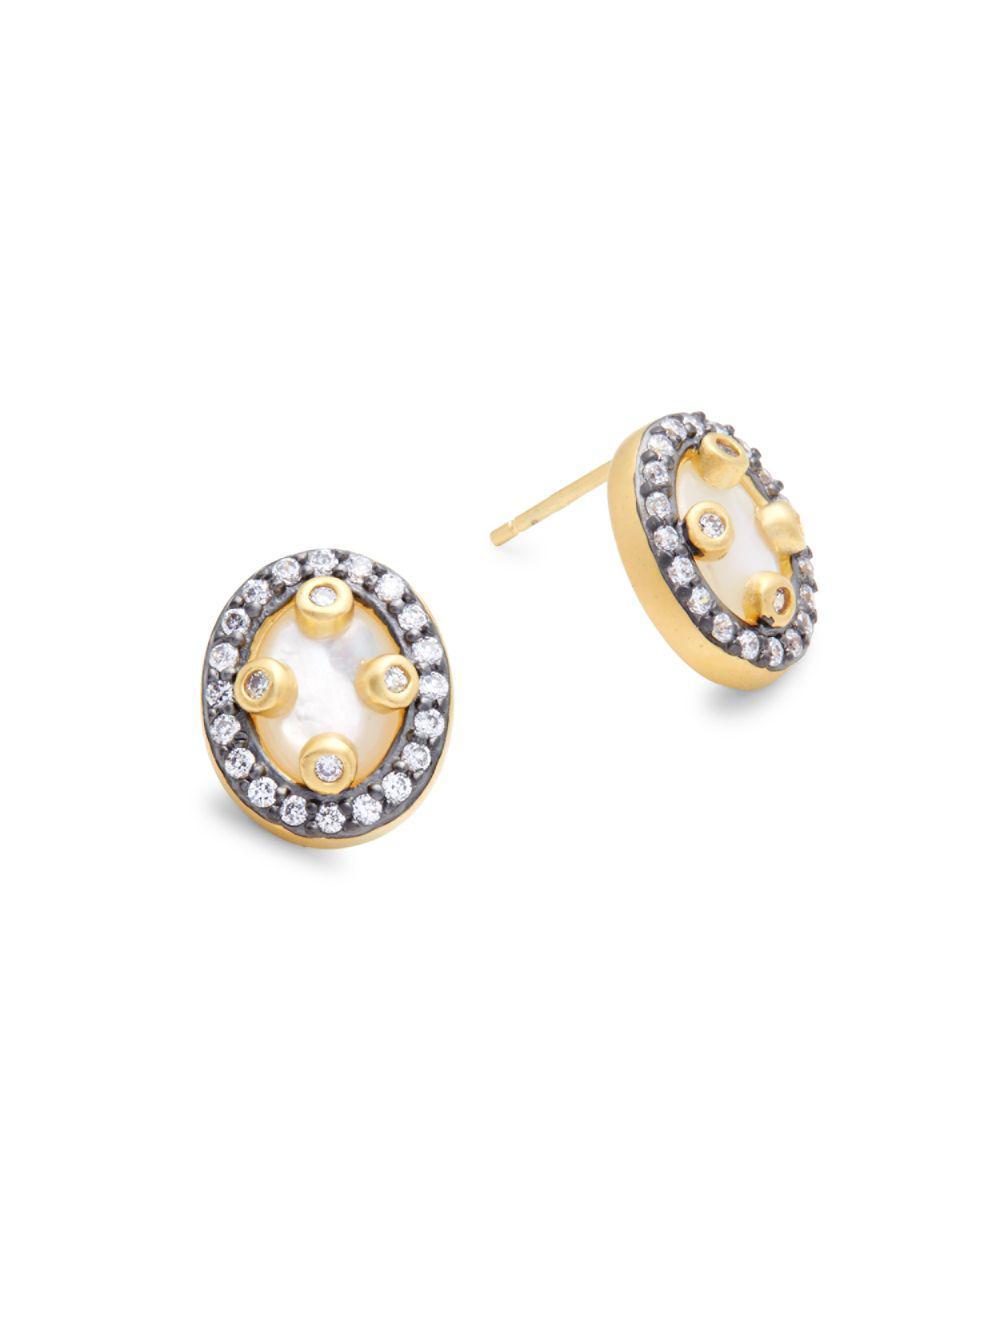 Freida Rothman Mother-of-Pearl Teardrop Earrings 0hKKNJ